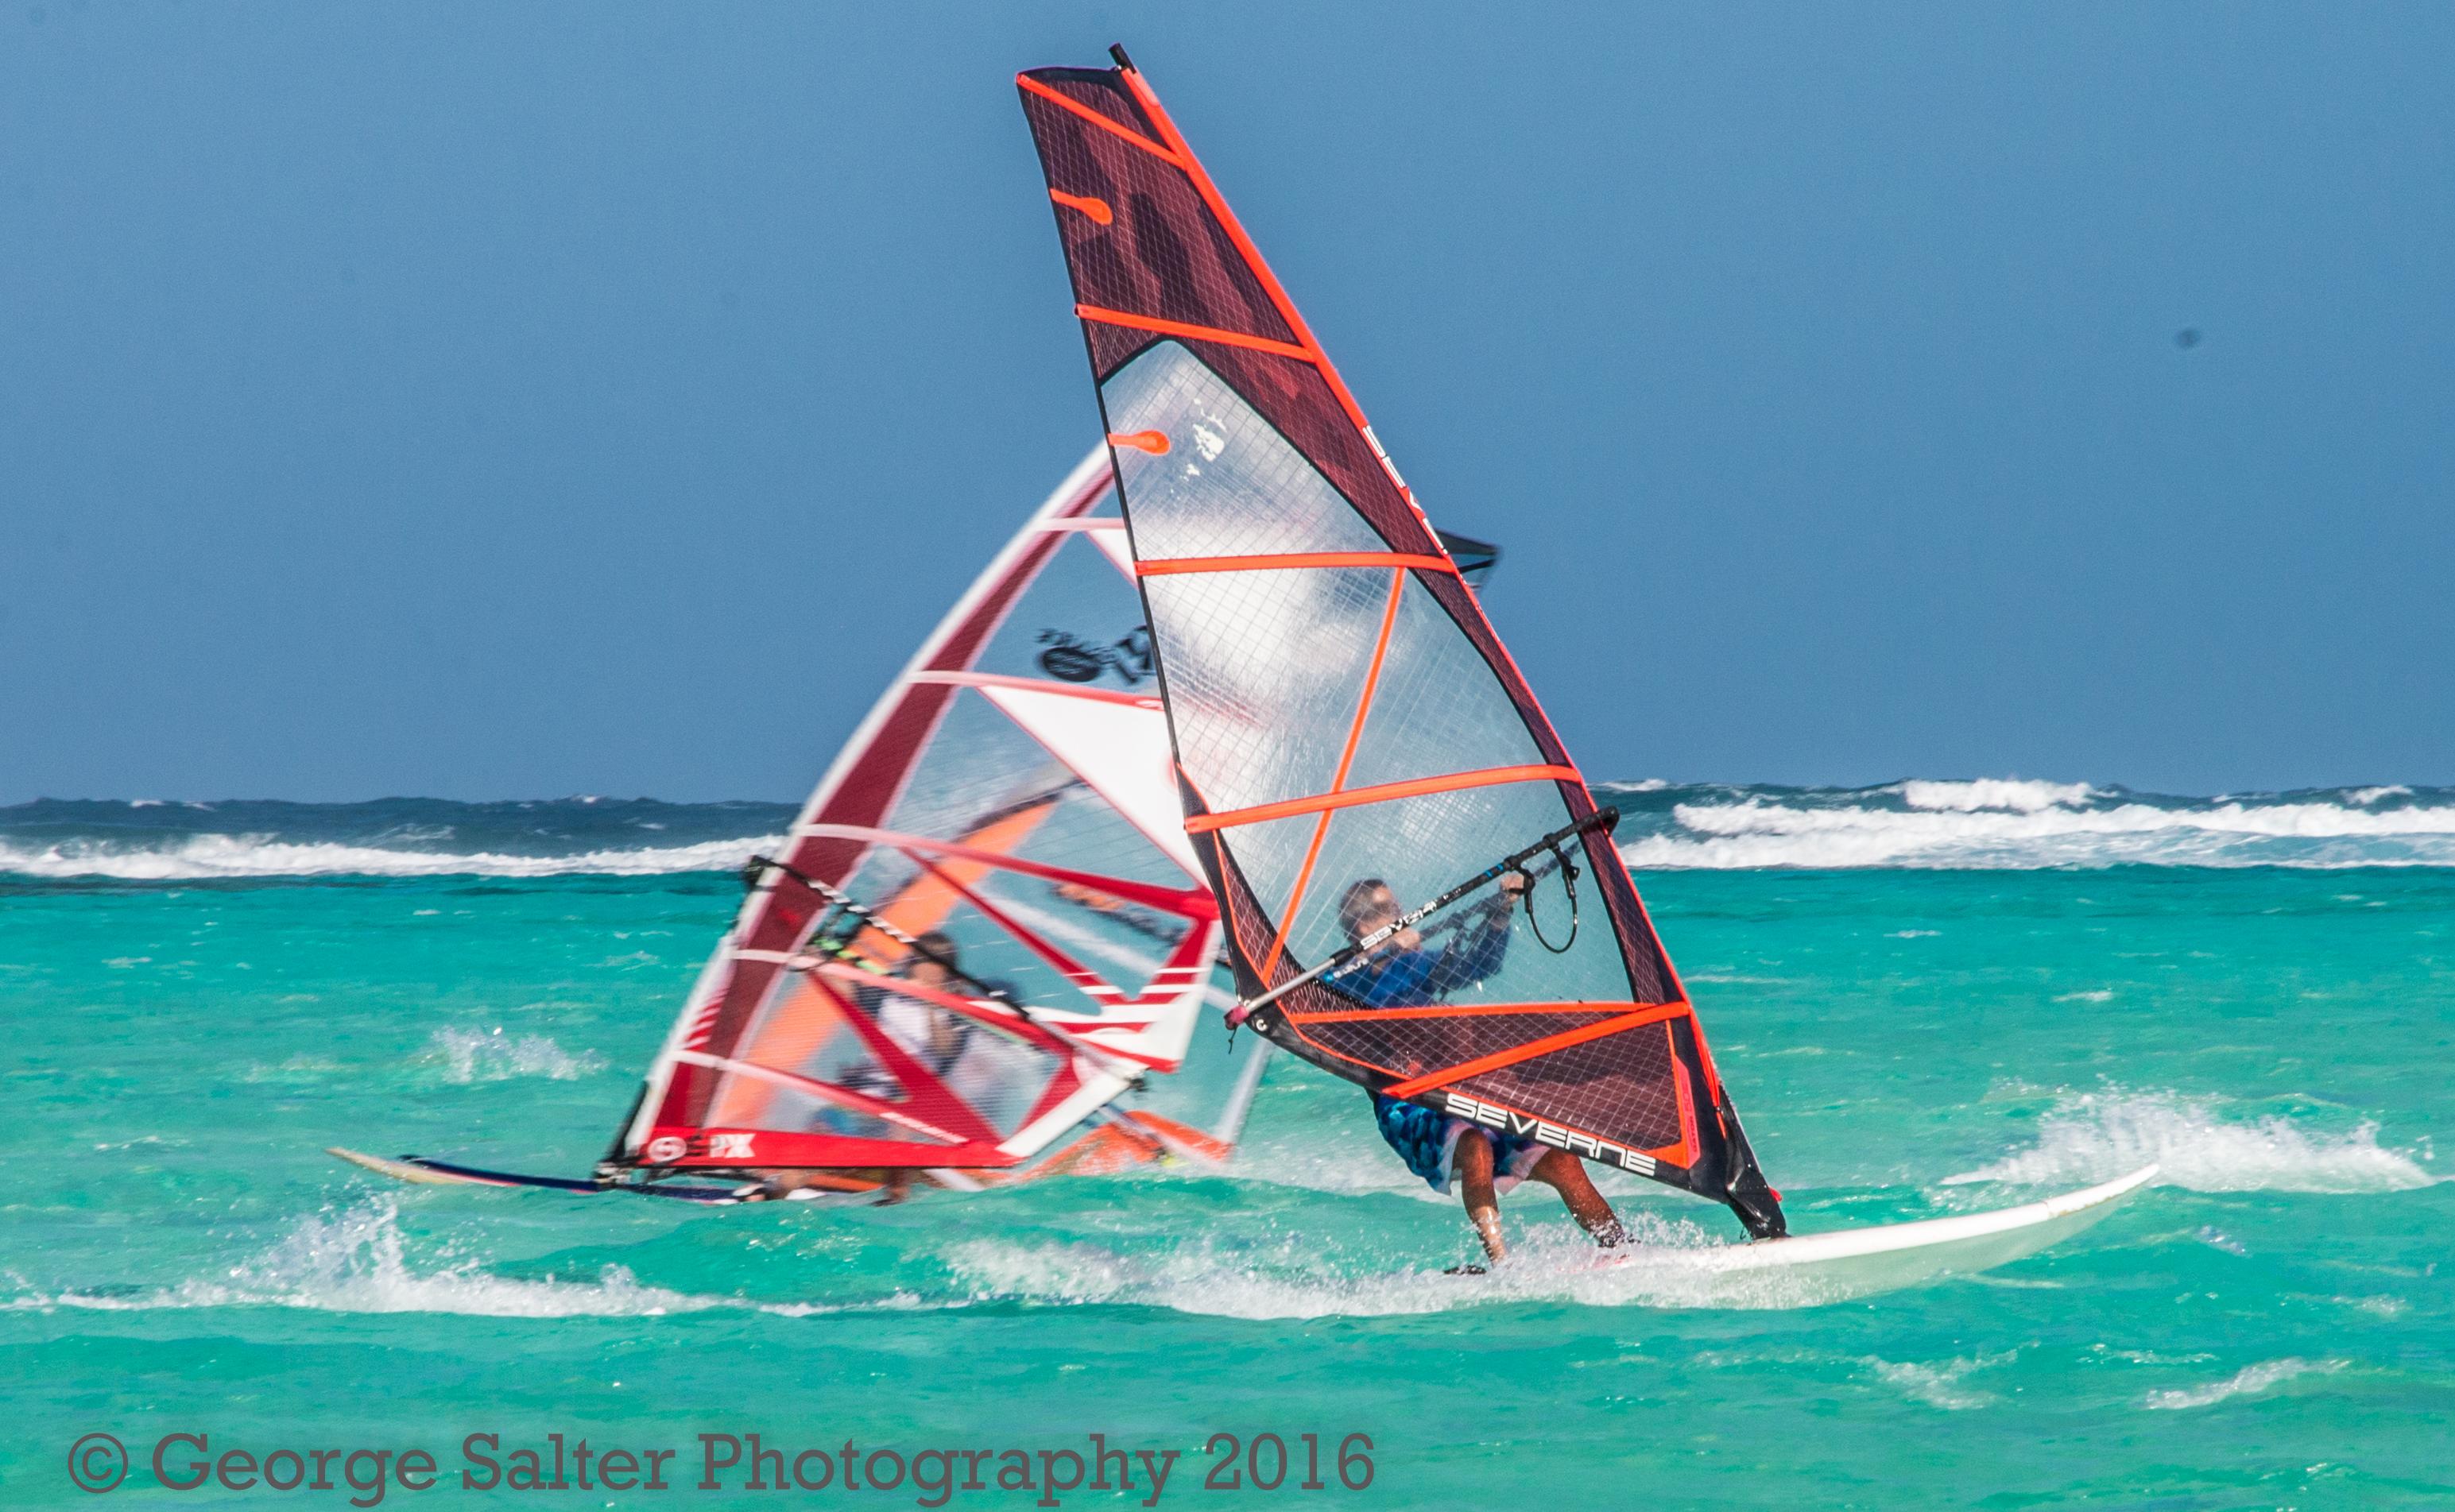 Dueling Windsurfers